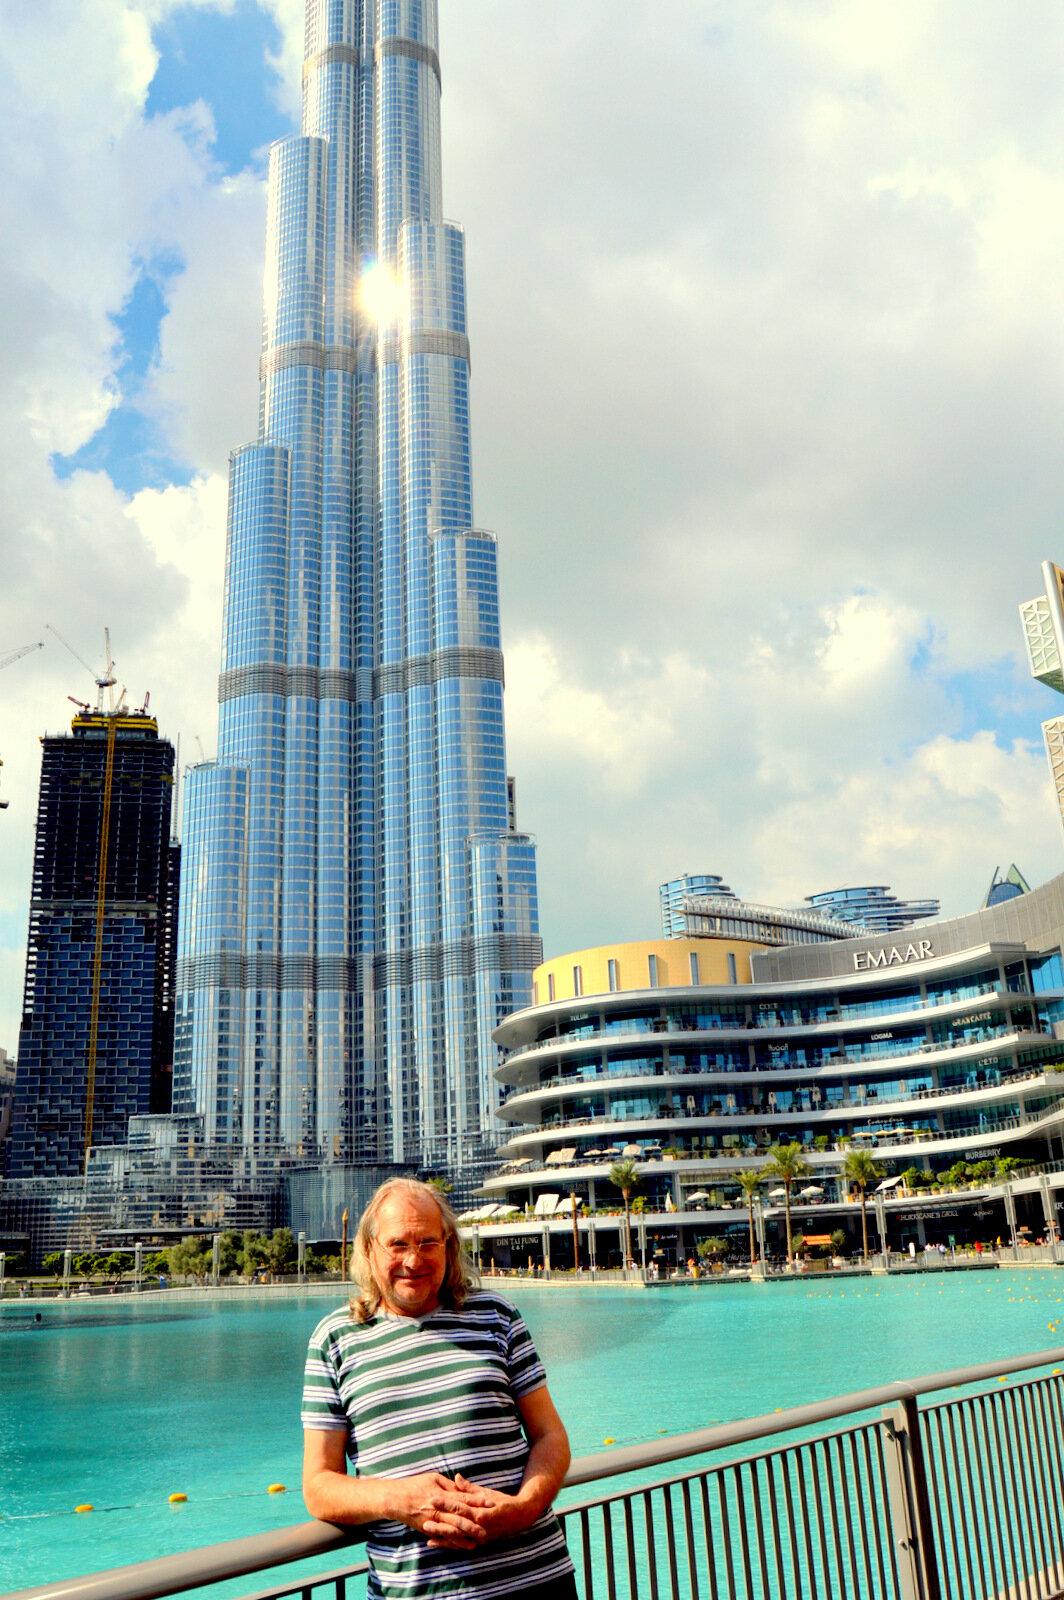 ОАЭ, Дубай. Прогулка к Аль-Фахиди Форту и Бурдж-Халифе, 15.01.2020 (продолжение)